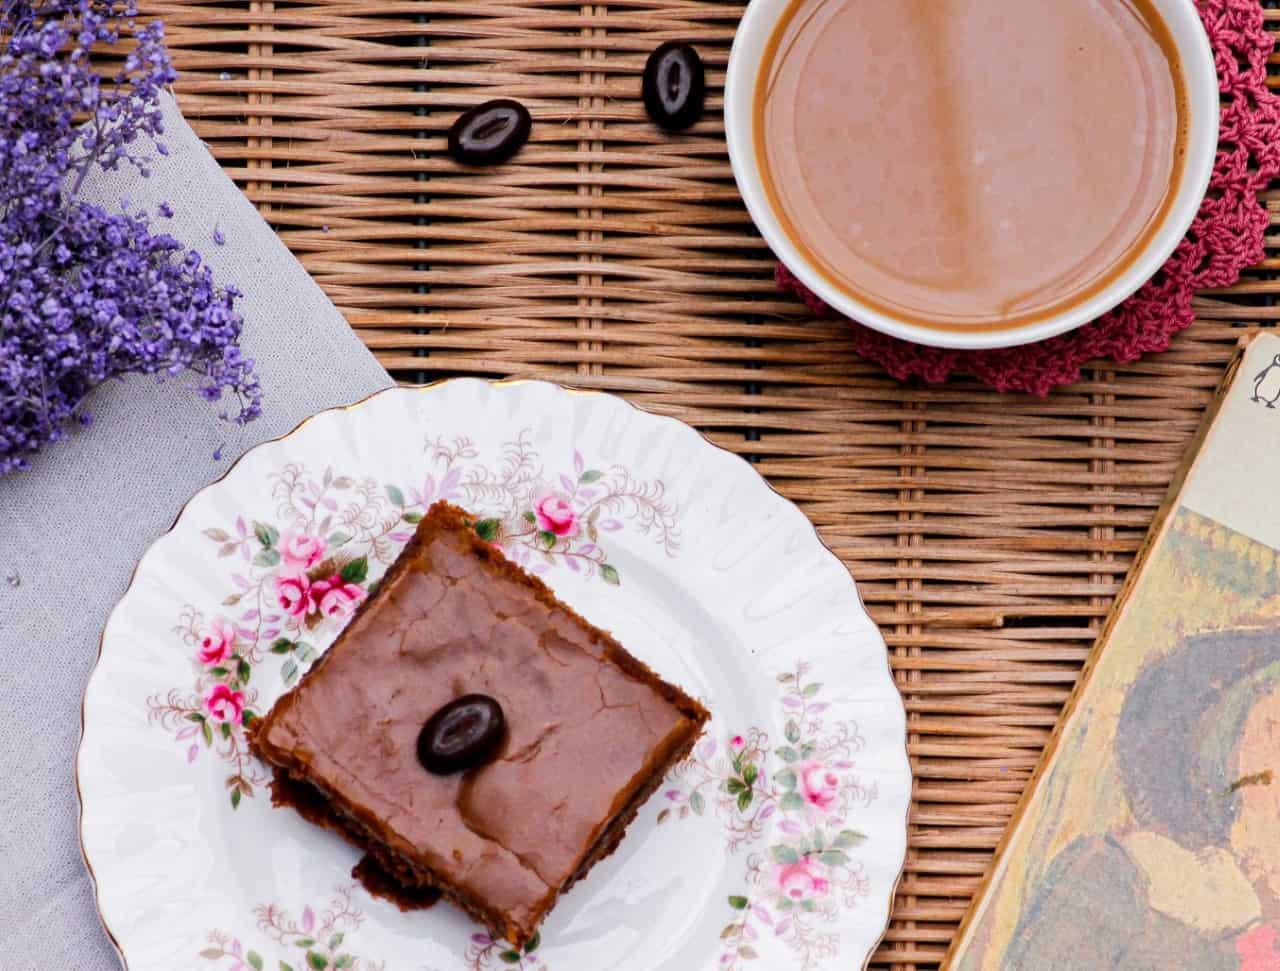 How to Make Vegan Espresso Brownies